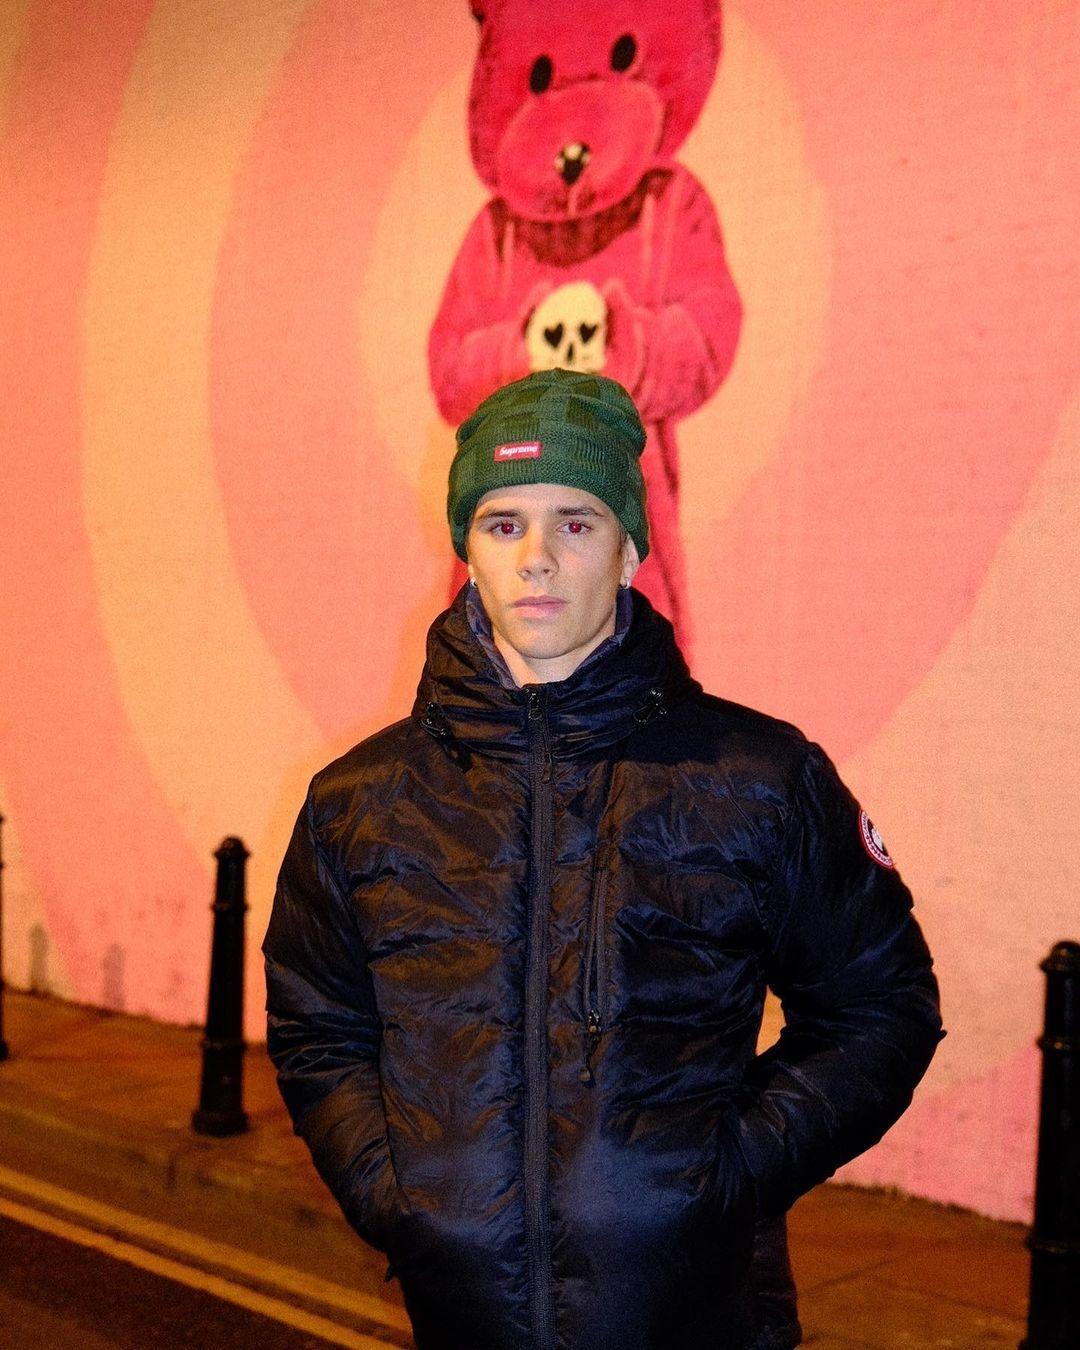 Romeo Beckham with LUAP's Pink Bear mural Love Life